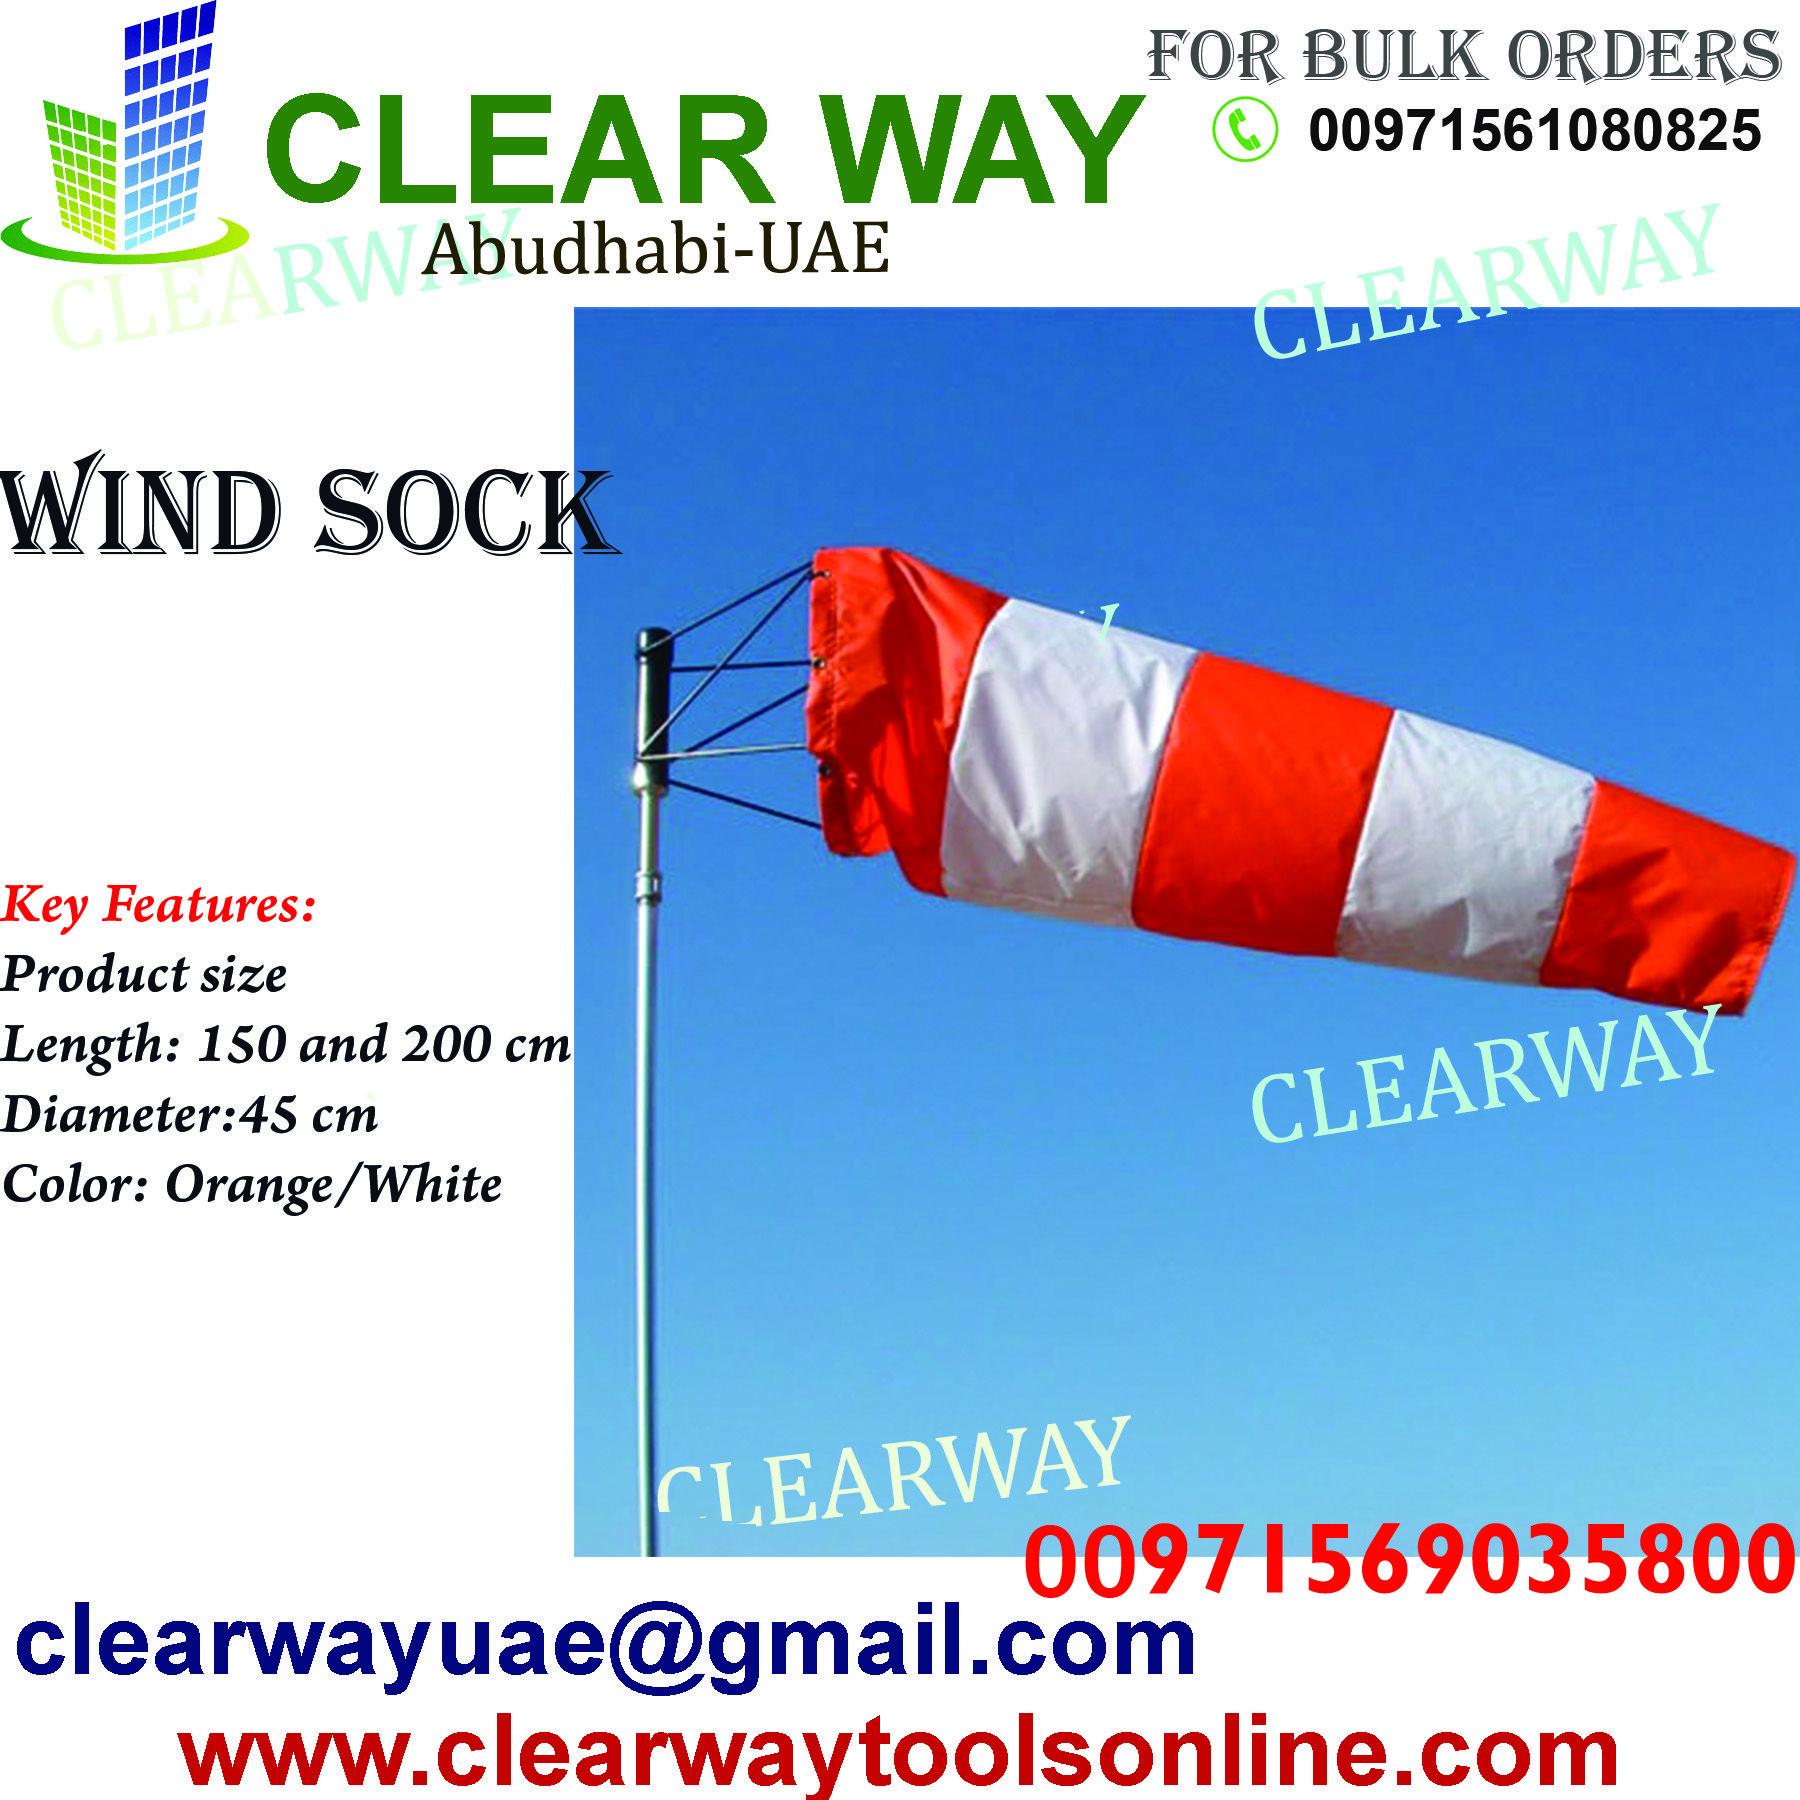 Windsock Dealer In Mussafah Abudhabi Uae In